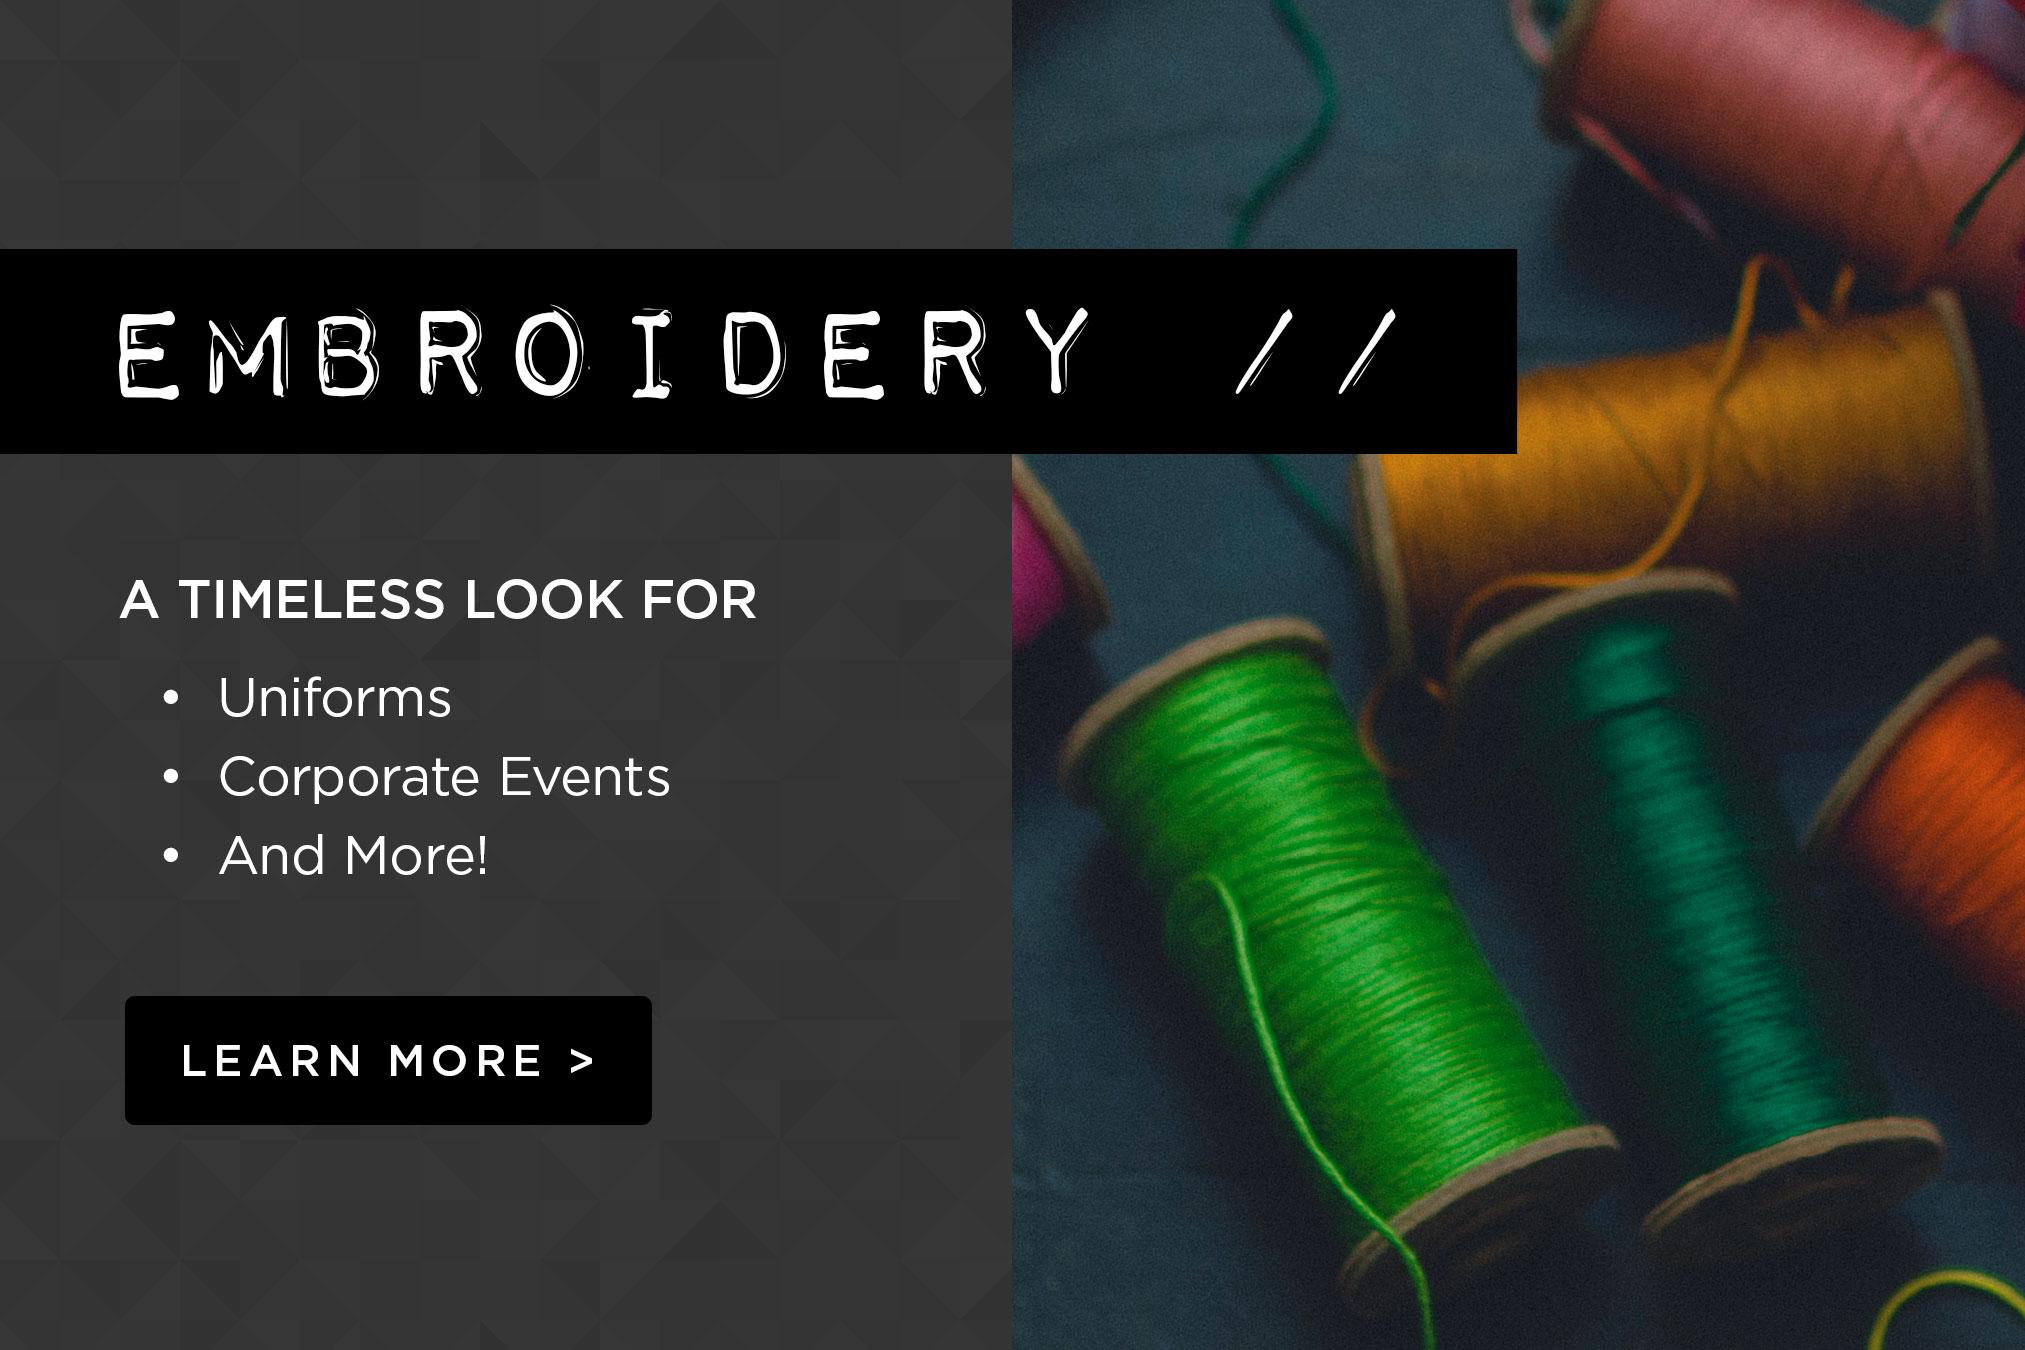 embroidery-slide-show-image.jpg